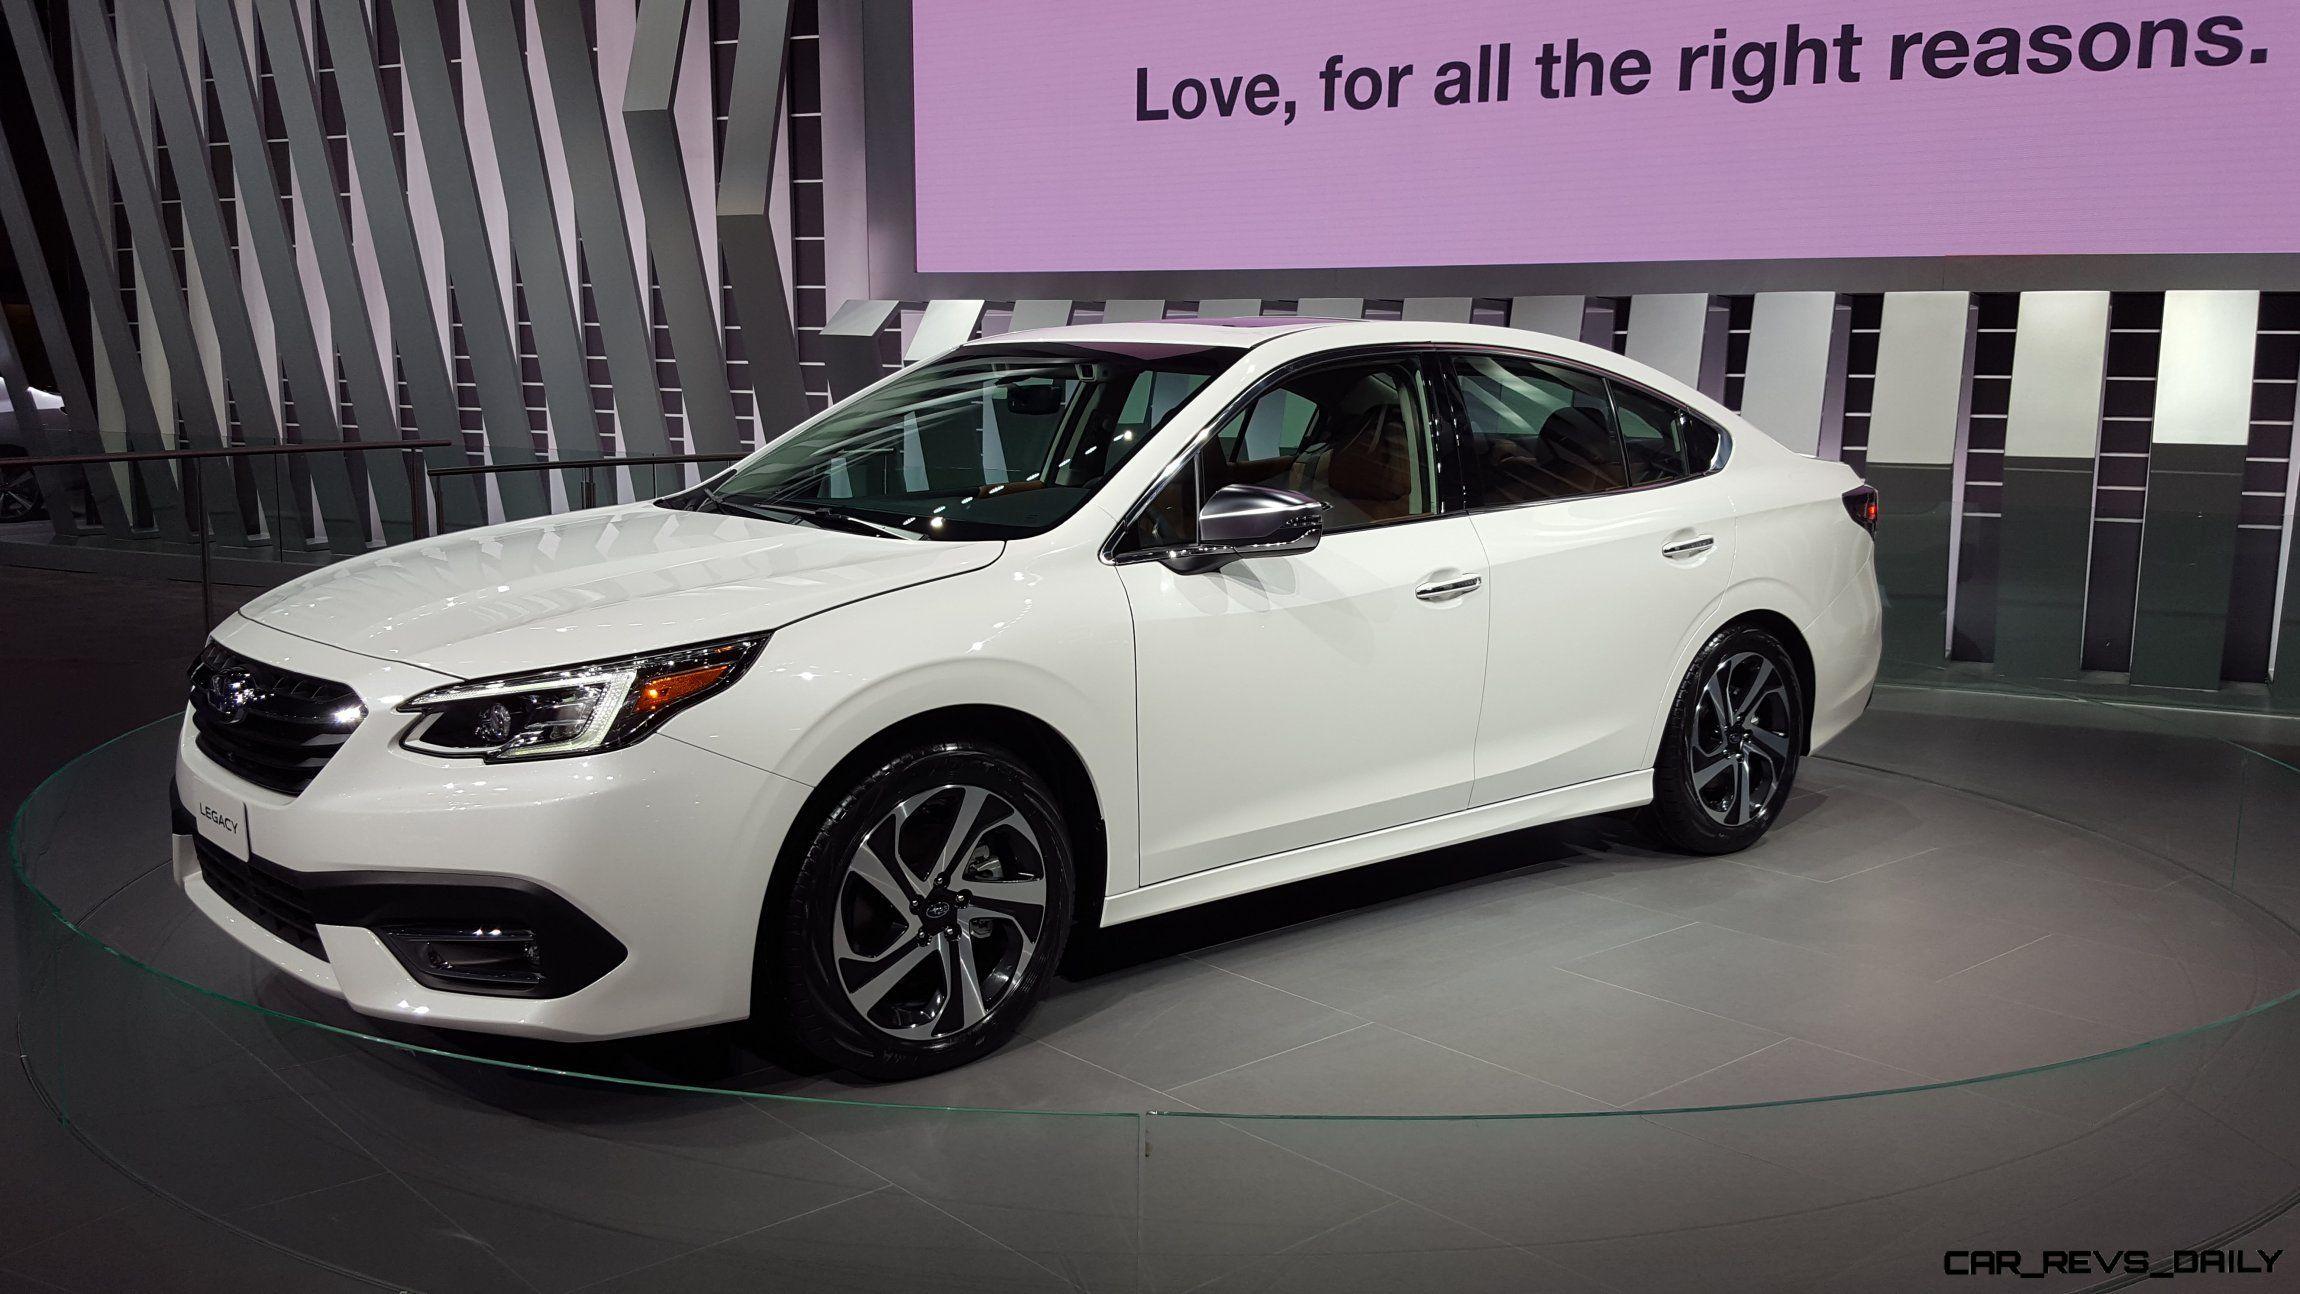 2020 Subaru Legacy Brings Big Screen And Turbocharged Power To Eager Buyers Video Subaru Legacy Subaru Car